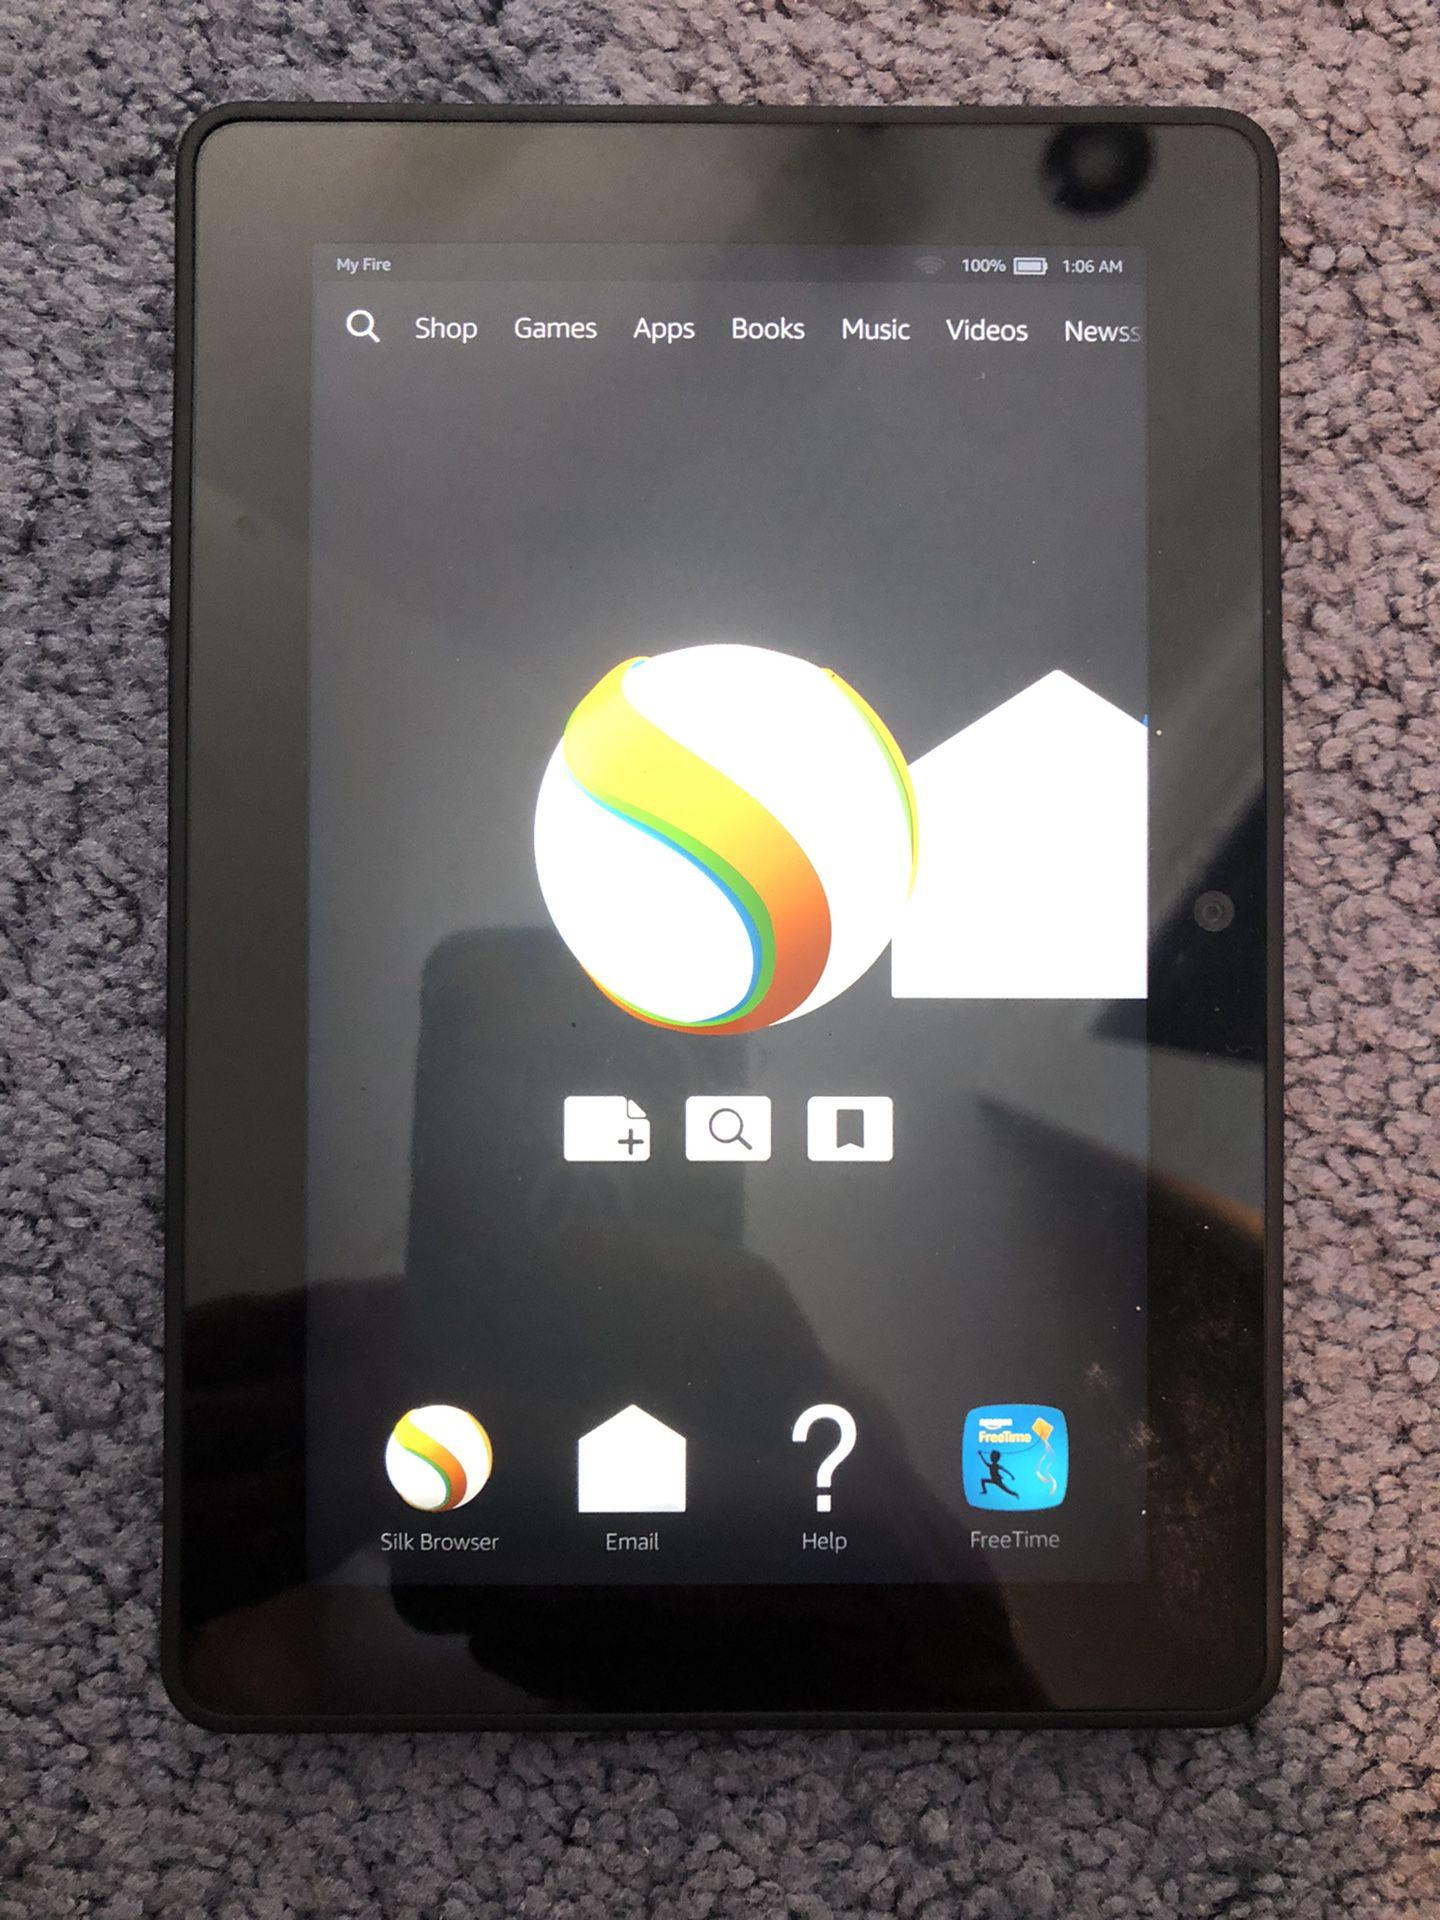 Amazon Fire tablet